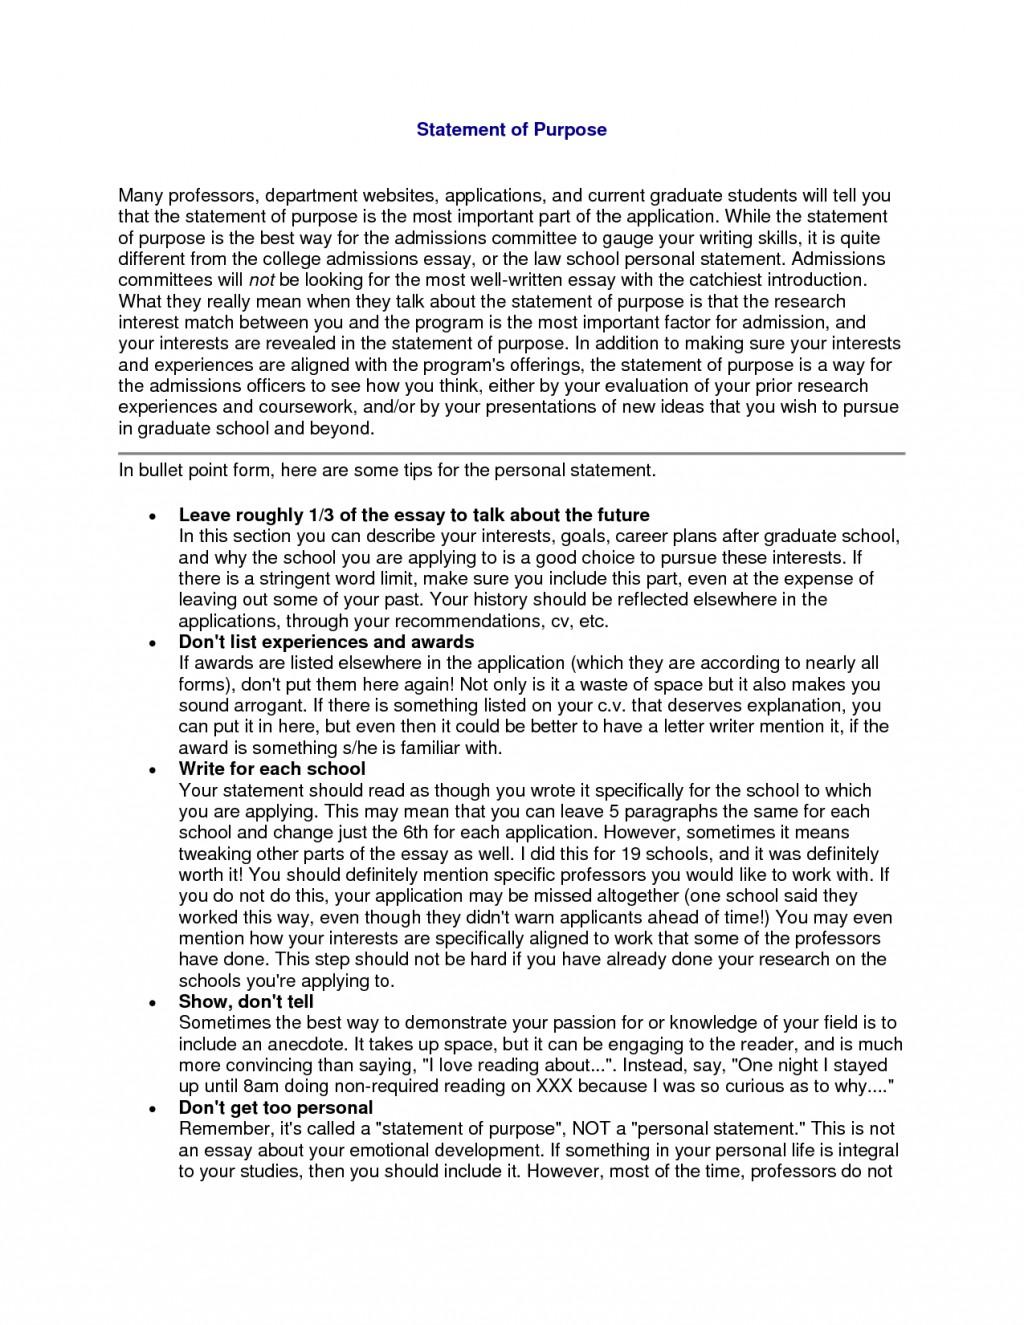 003 Essay Example Graduate School Statement Of Purpose Scvjvatw Sample Top Essays Examples Mba Nursing Large